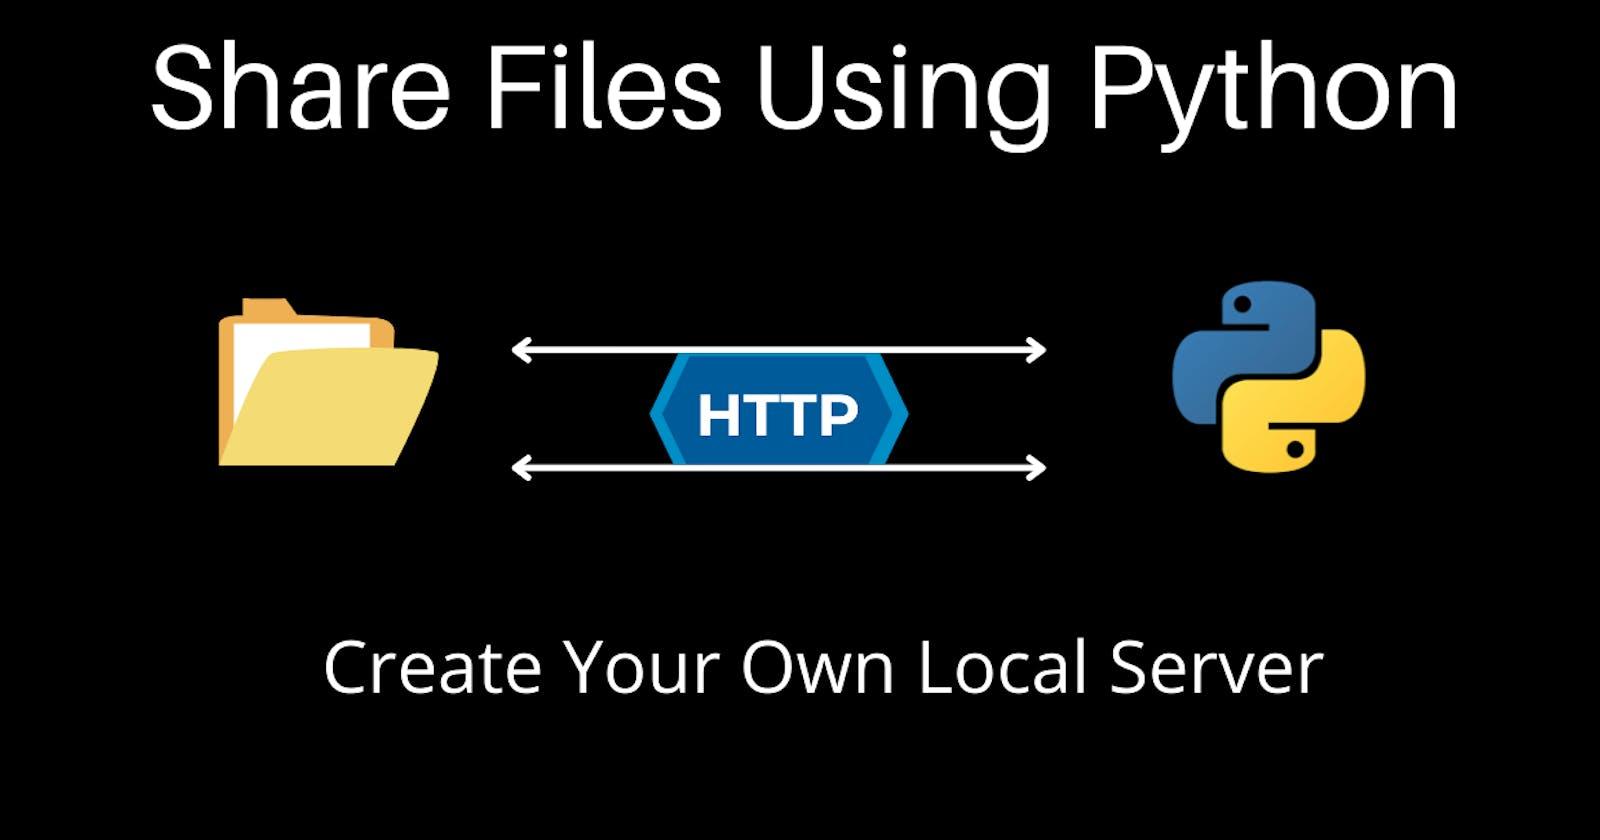 Share Files Easily Using Python